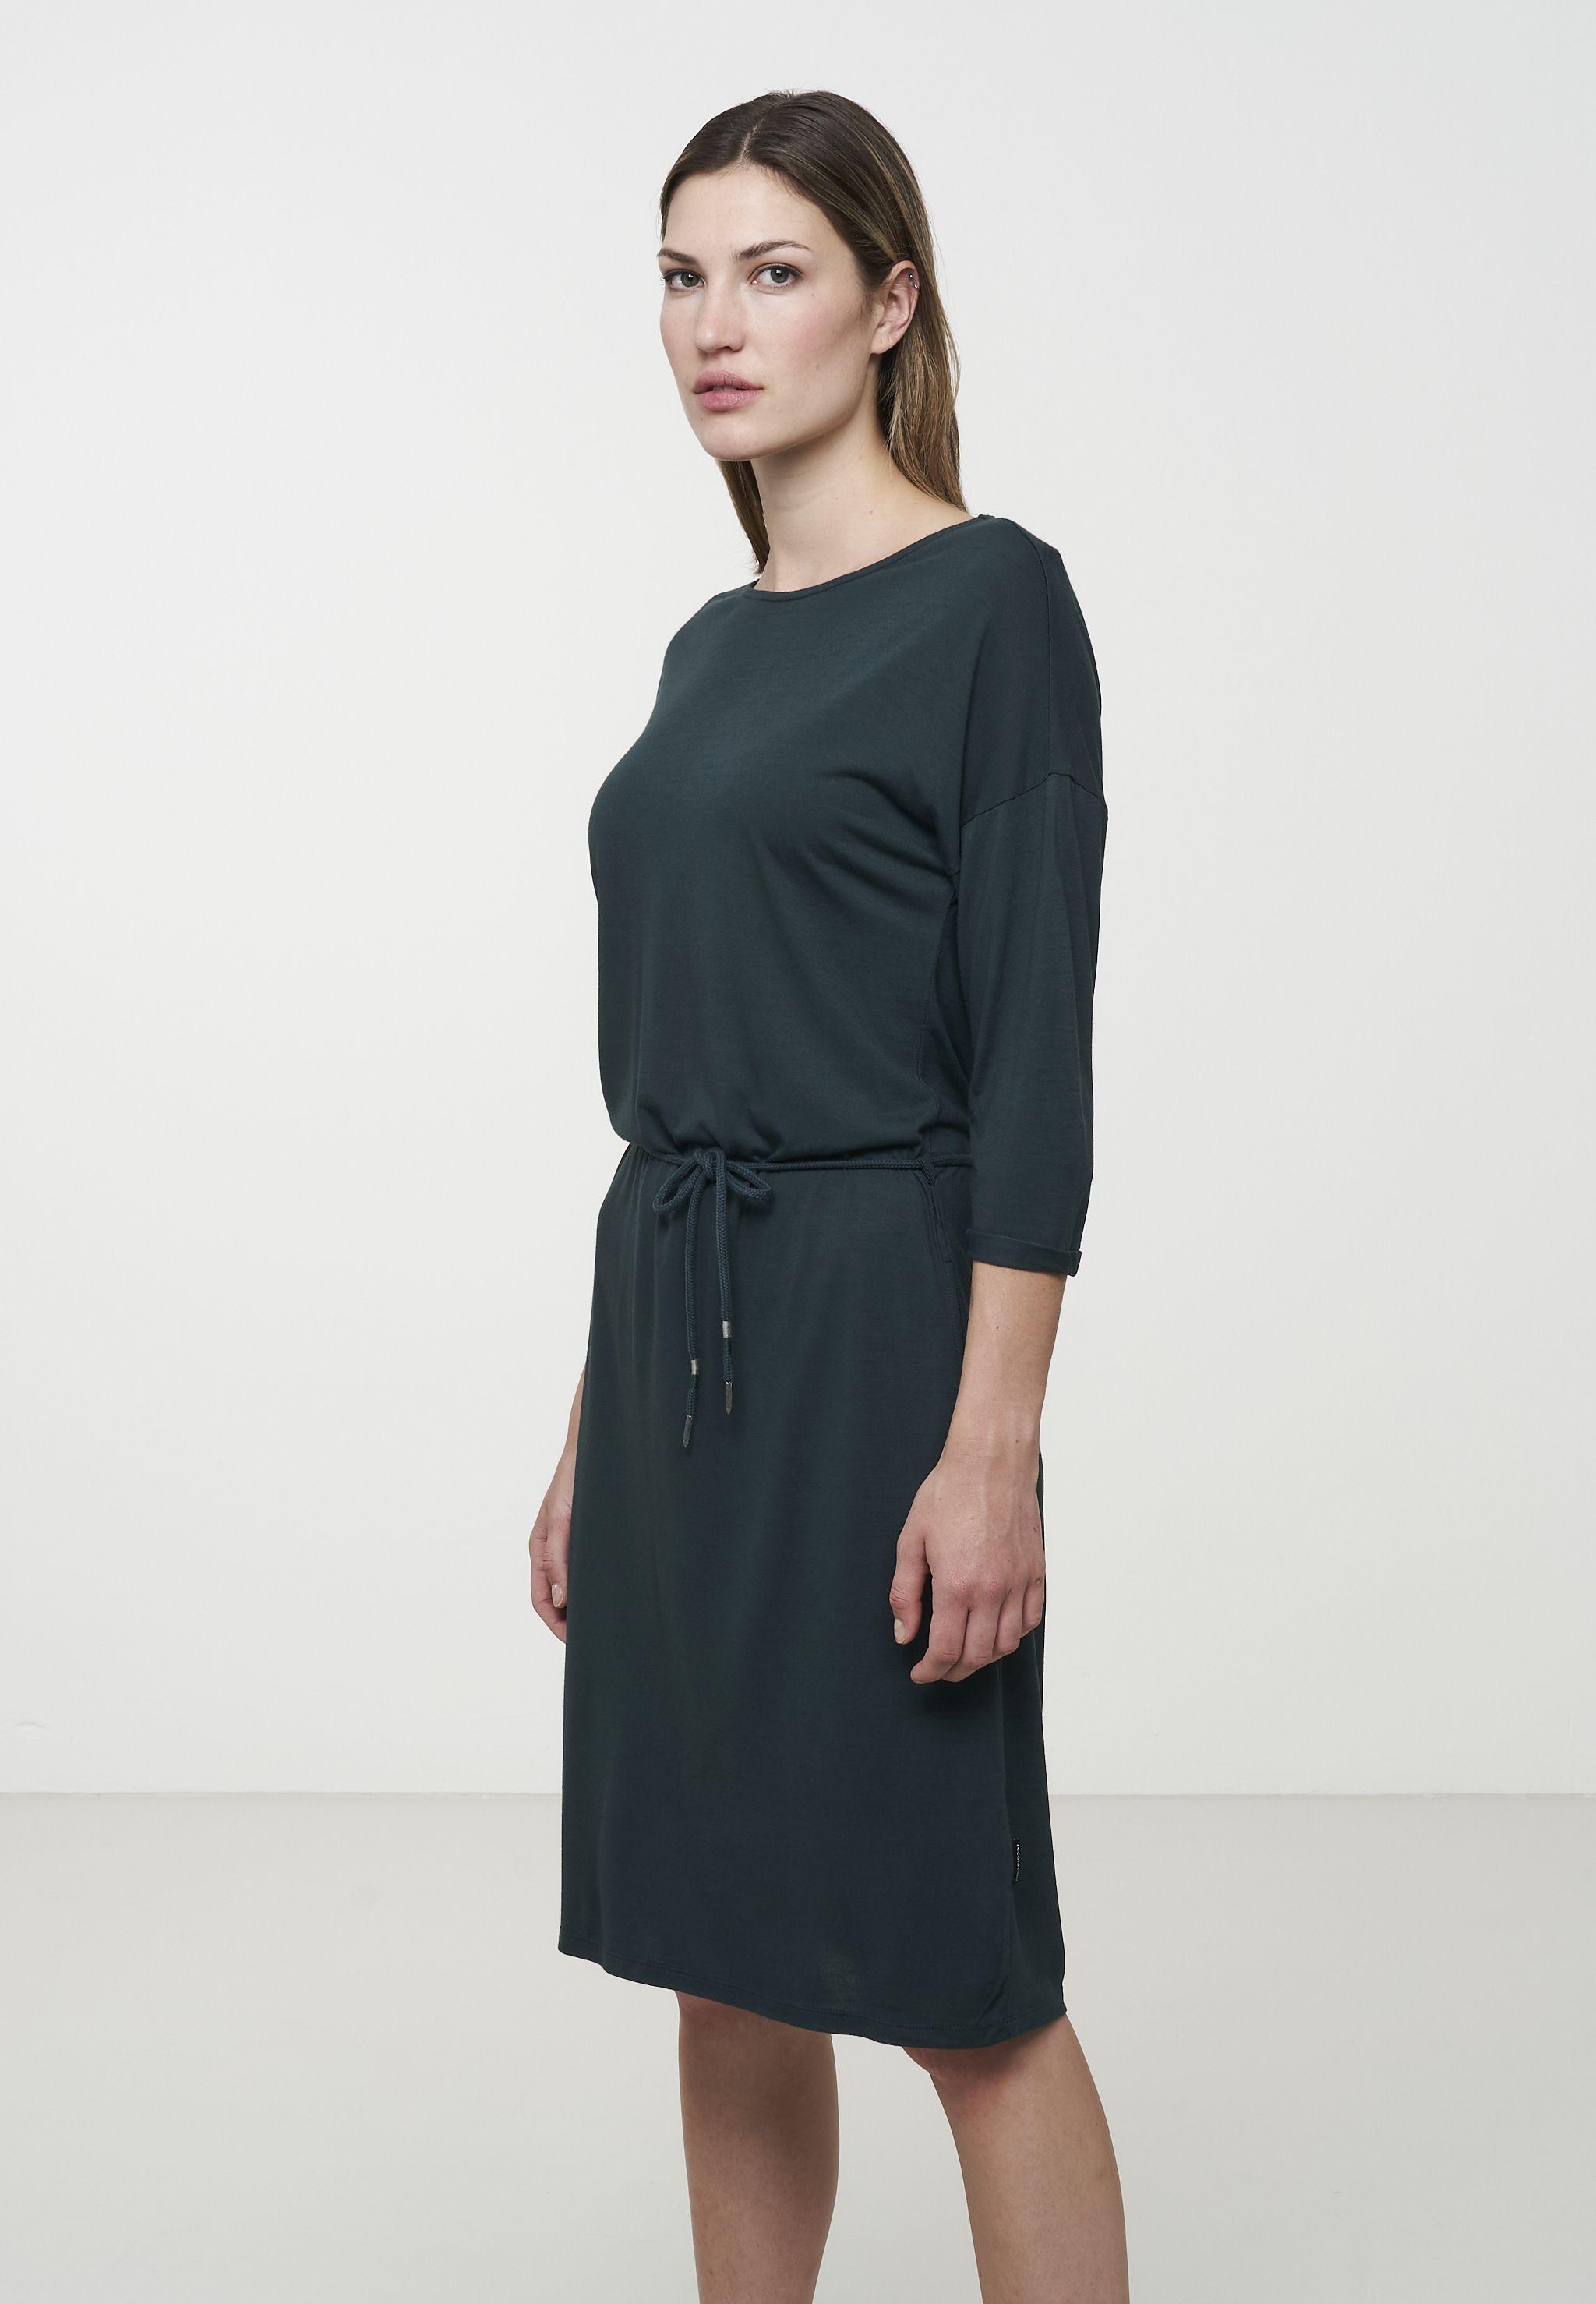 Damen-Kleid ARALIA forest green